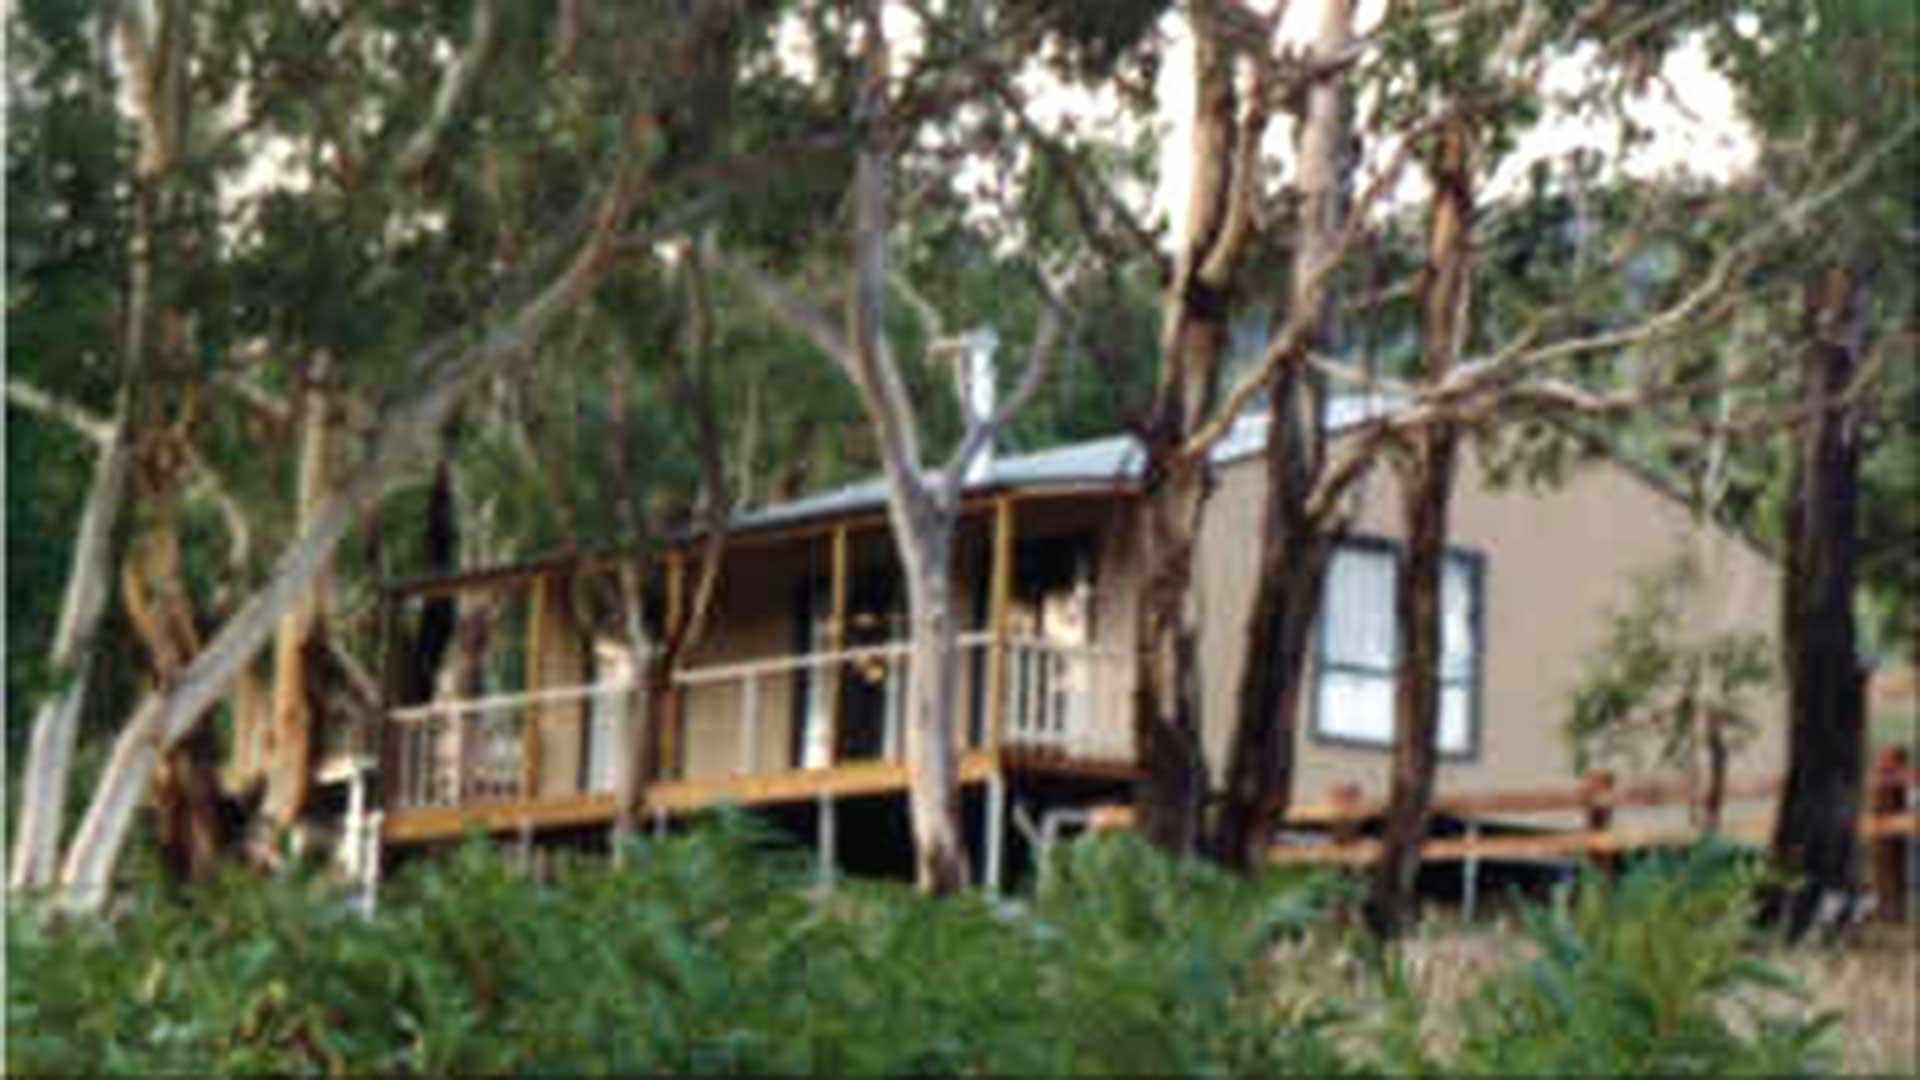 Accommodation - Glenroy Cottages & Camping | Visit Oberon